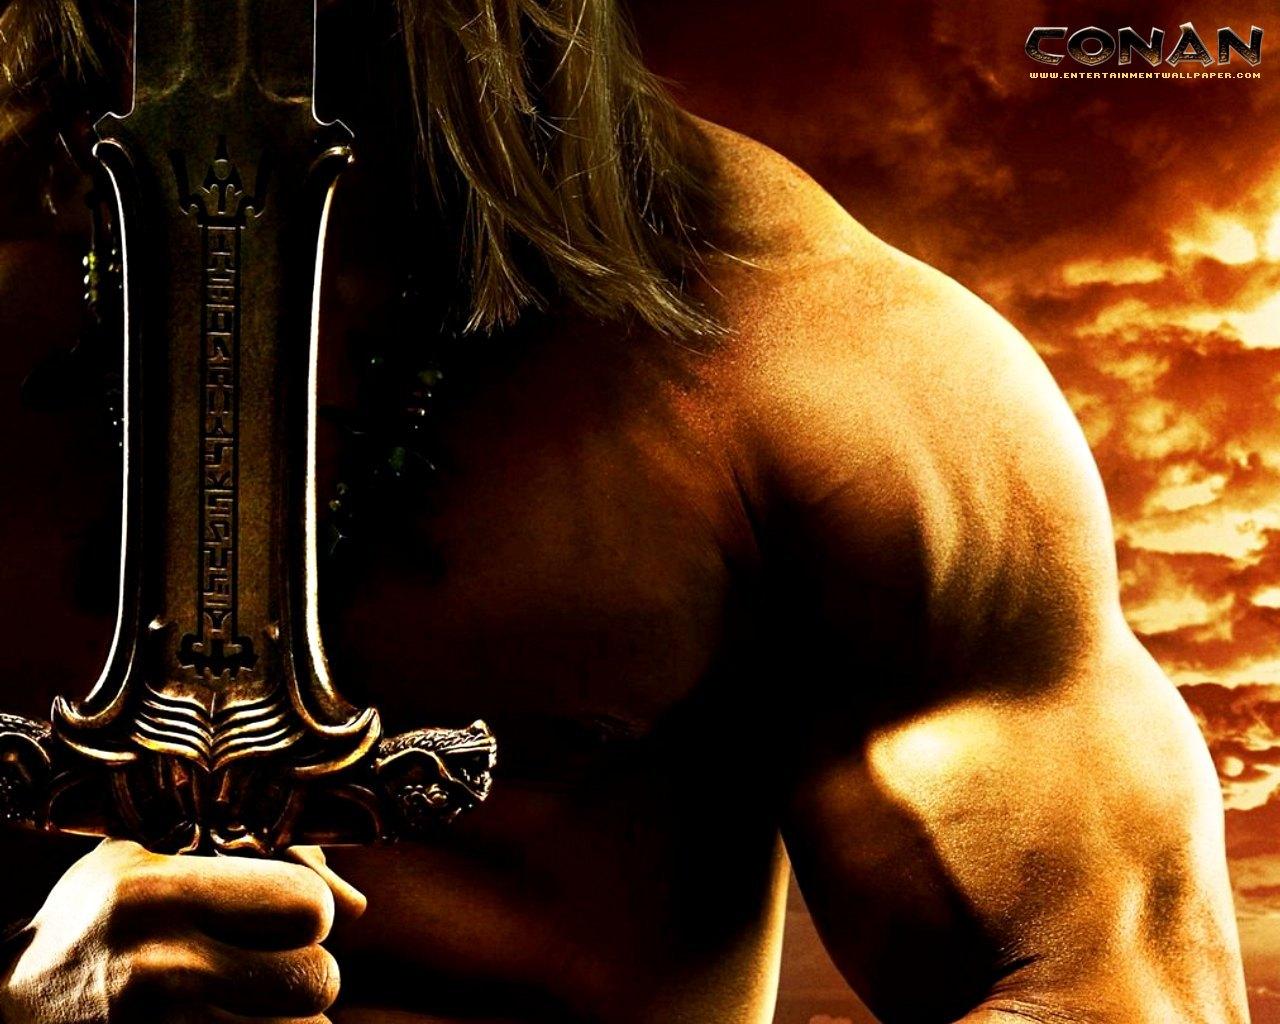 Free Download Conan The Barbarian Conan The Barbarian 2011